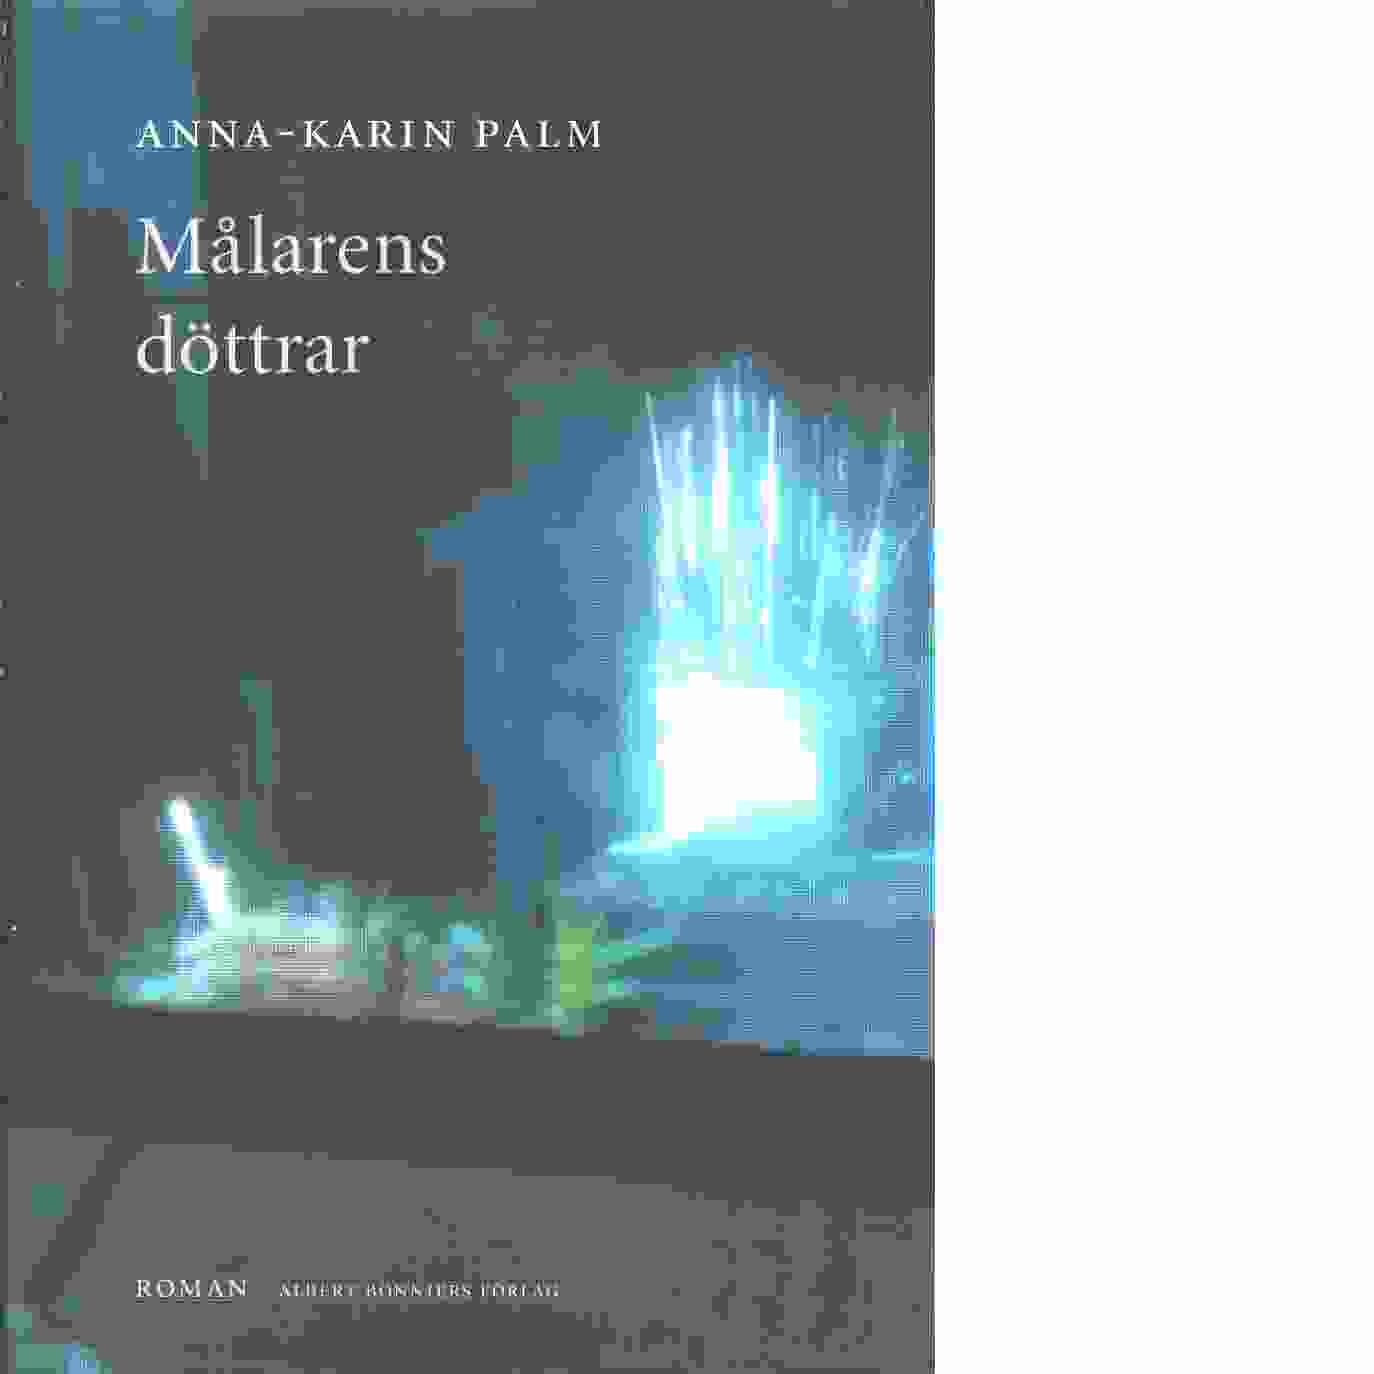 Målarens döttrar - Palm, Anna-Karin